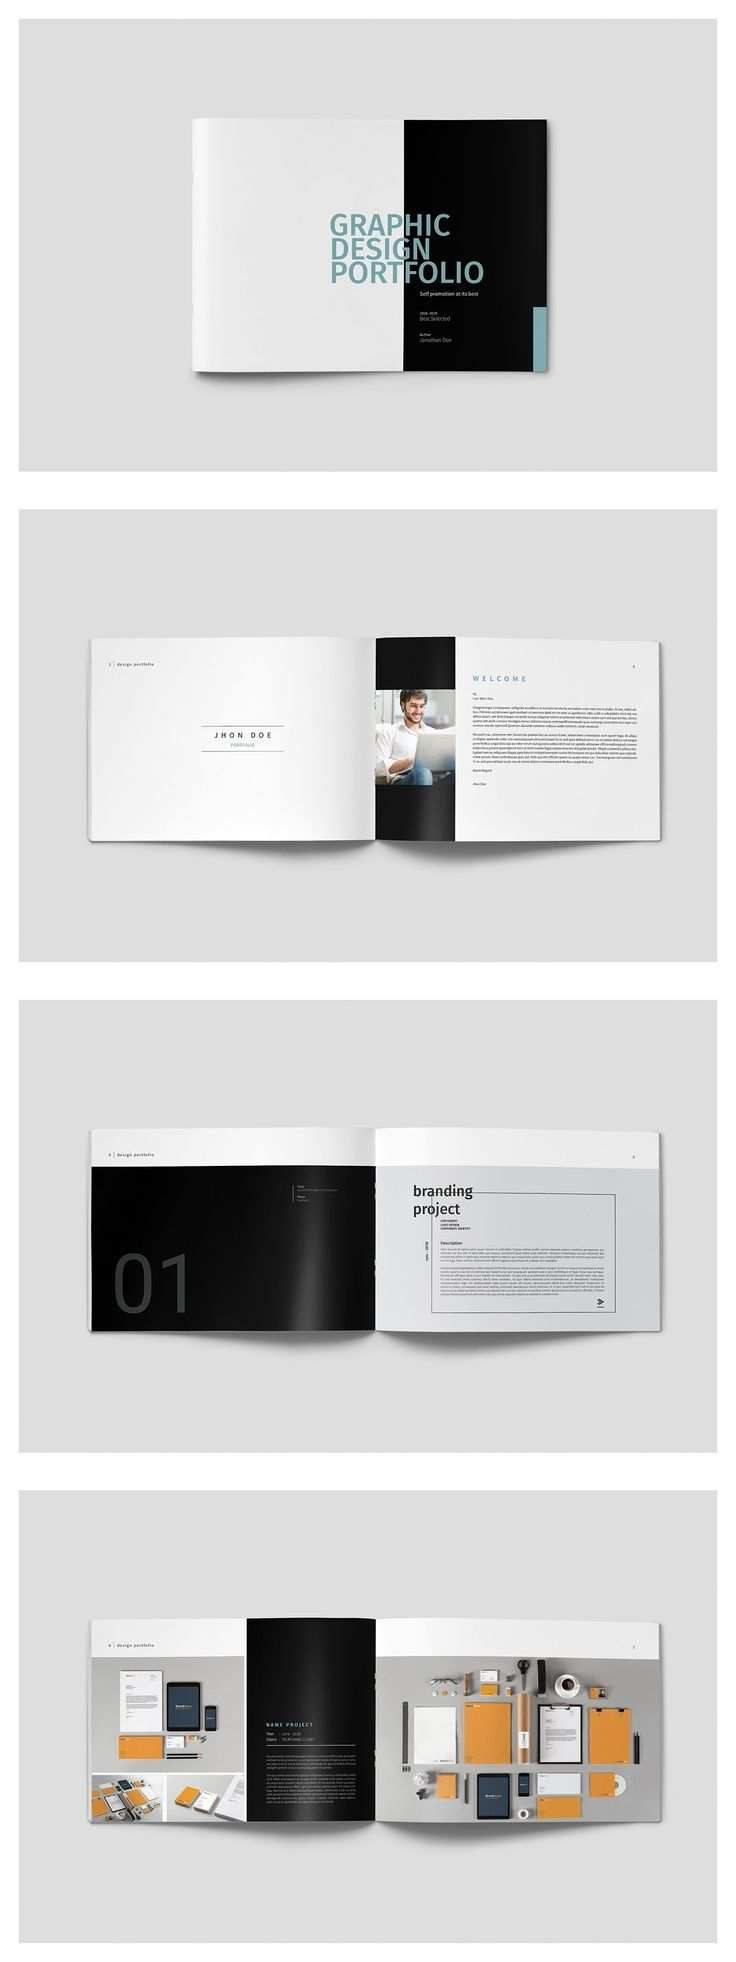 Graphic Design Portfolio Template Graphicdesign Portfolio Brochure Template Indesign Portfolio Design Portfolio Template Design Portfolio Design Layout